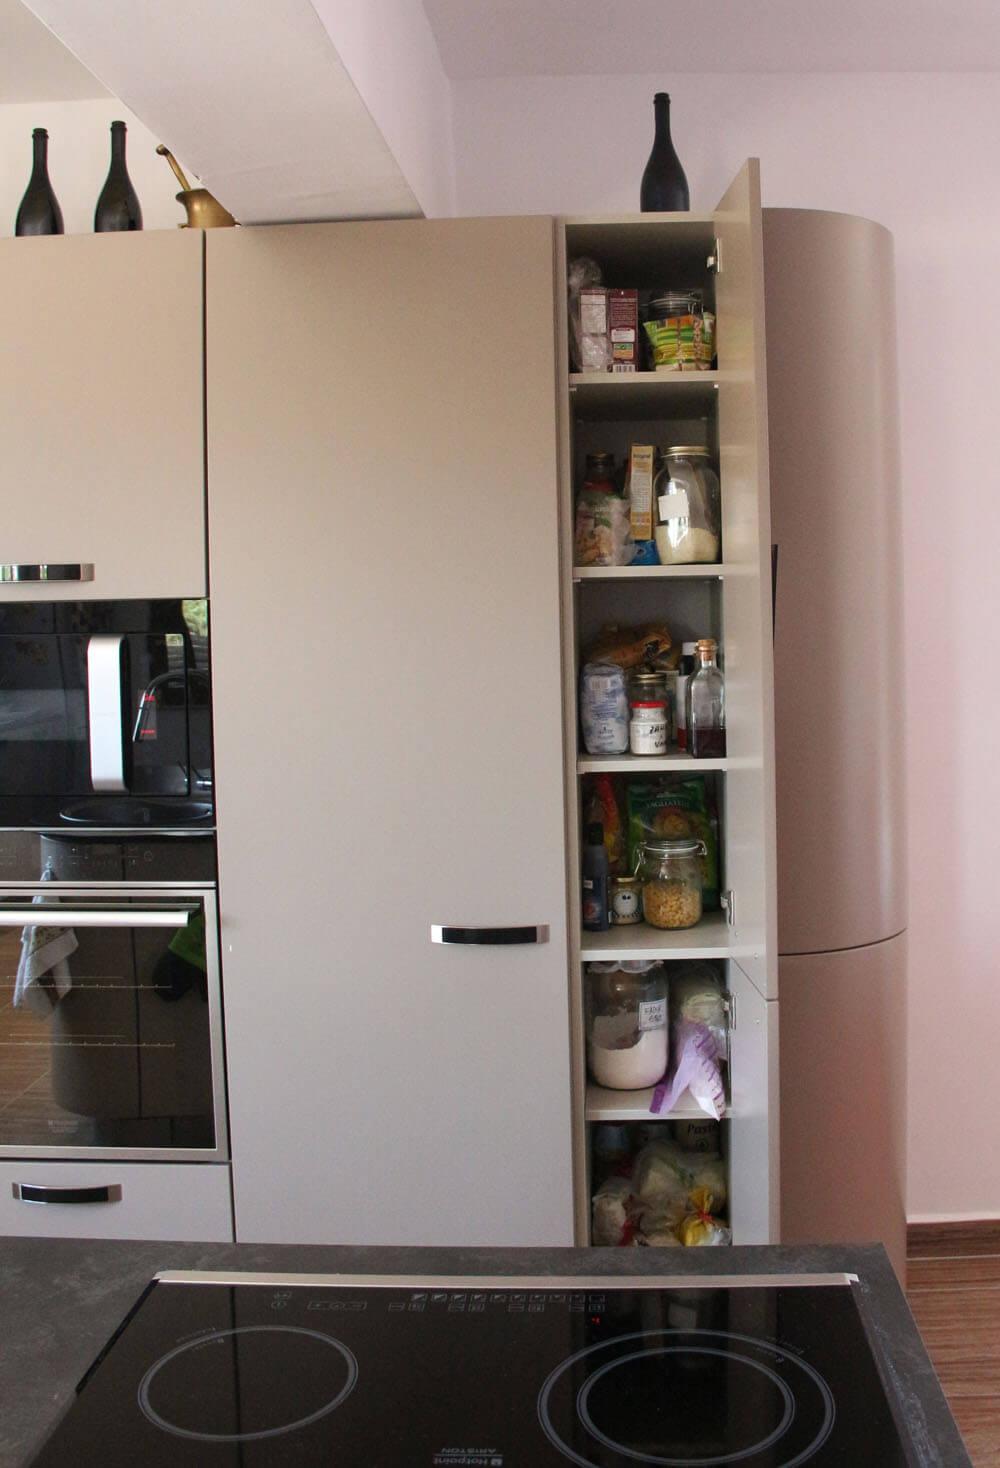 В кухне предусмотрено много мест для хранения